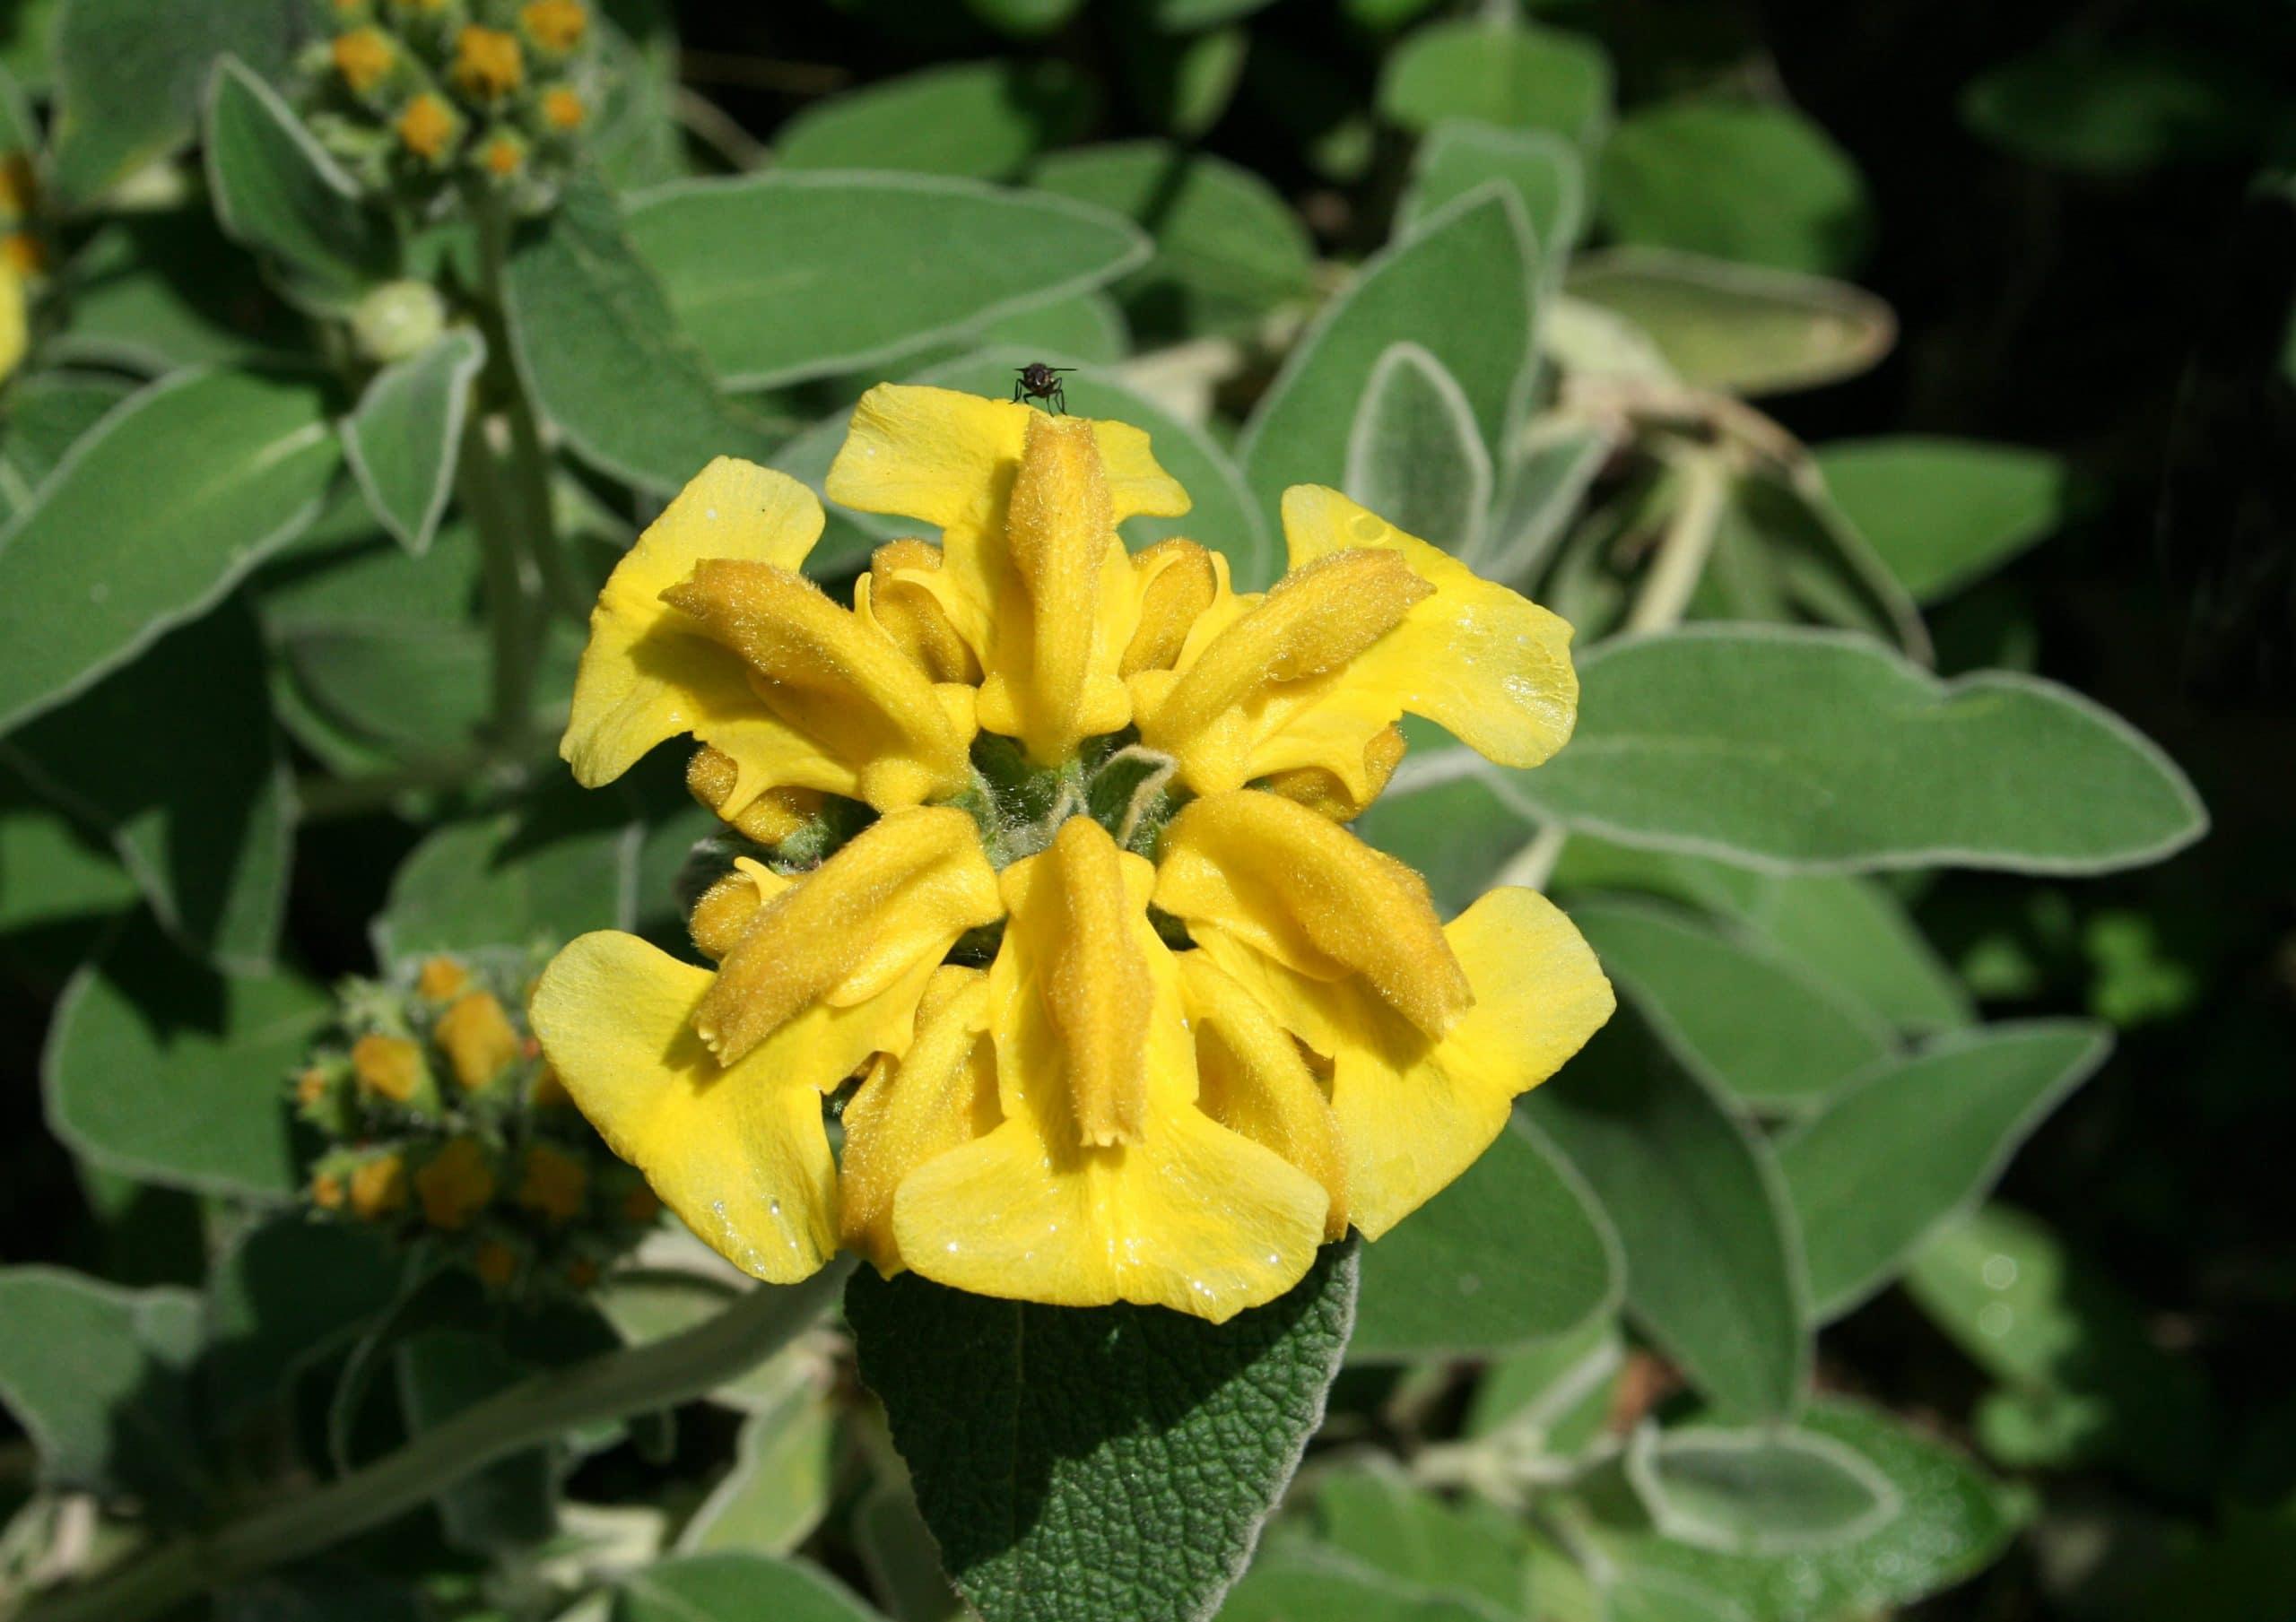 Flore de la planta Phlomis fruticosa